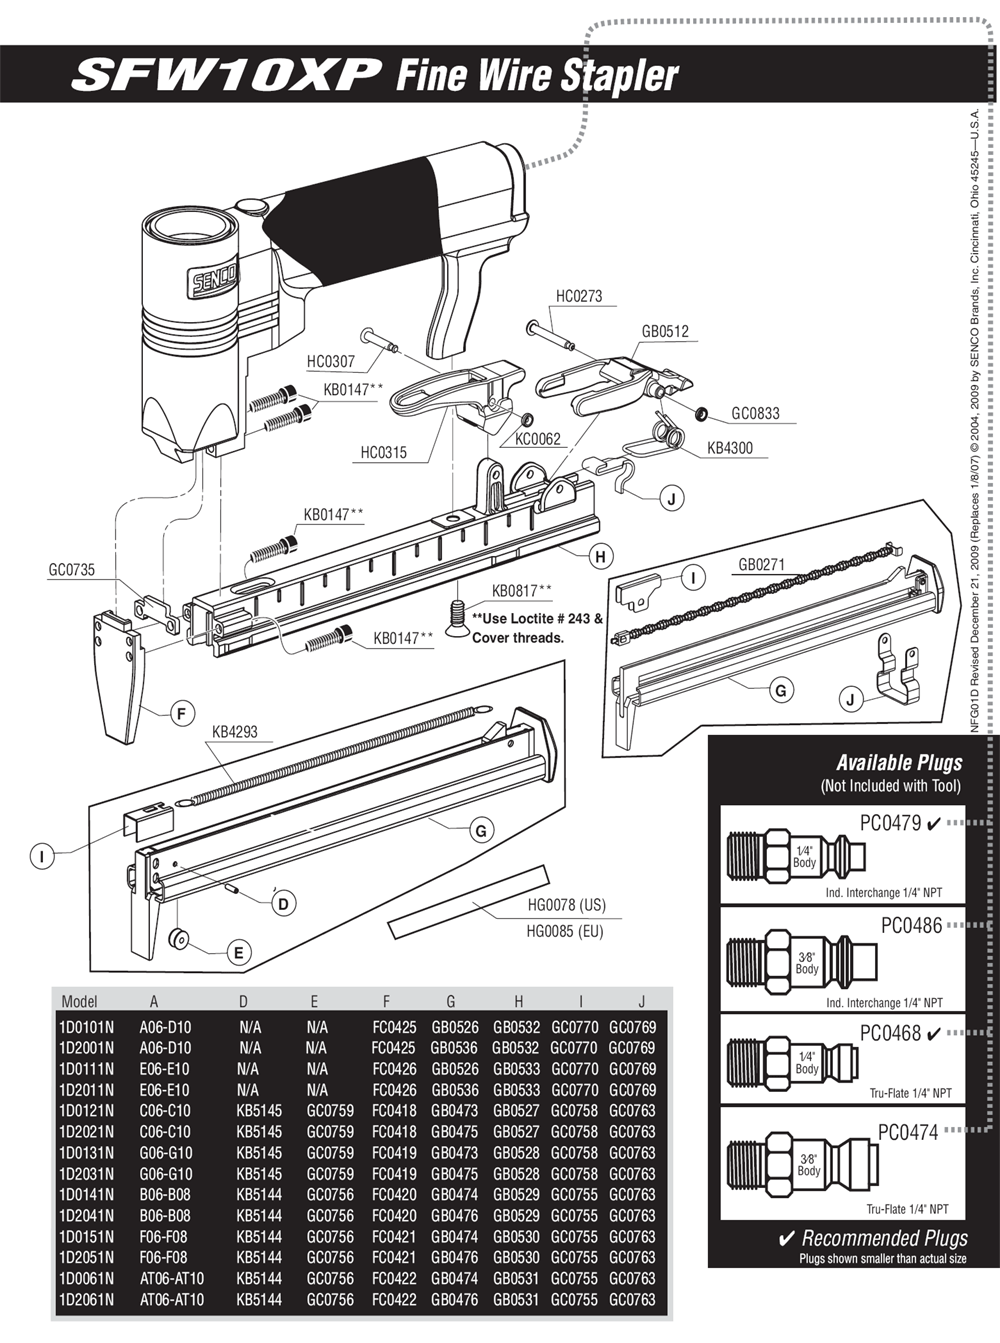 1D0101N-senco-PB-1Break Down